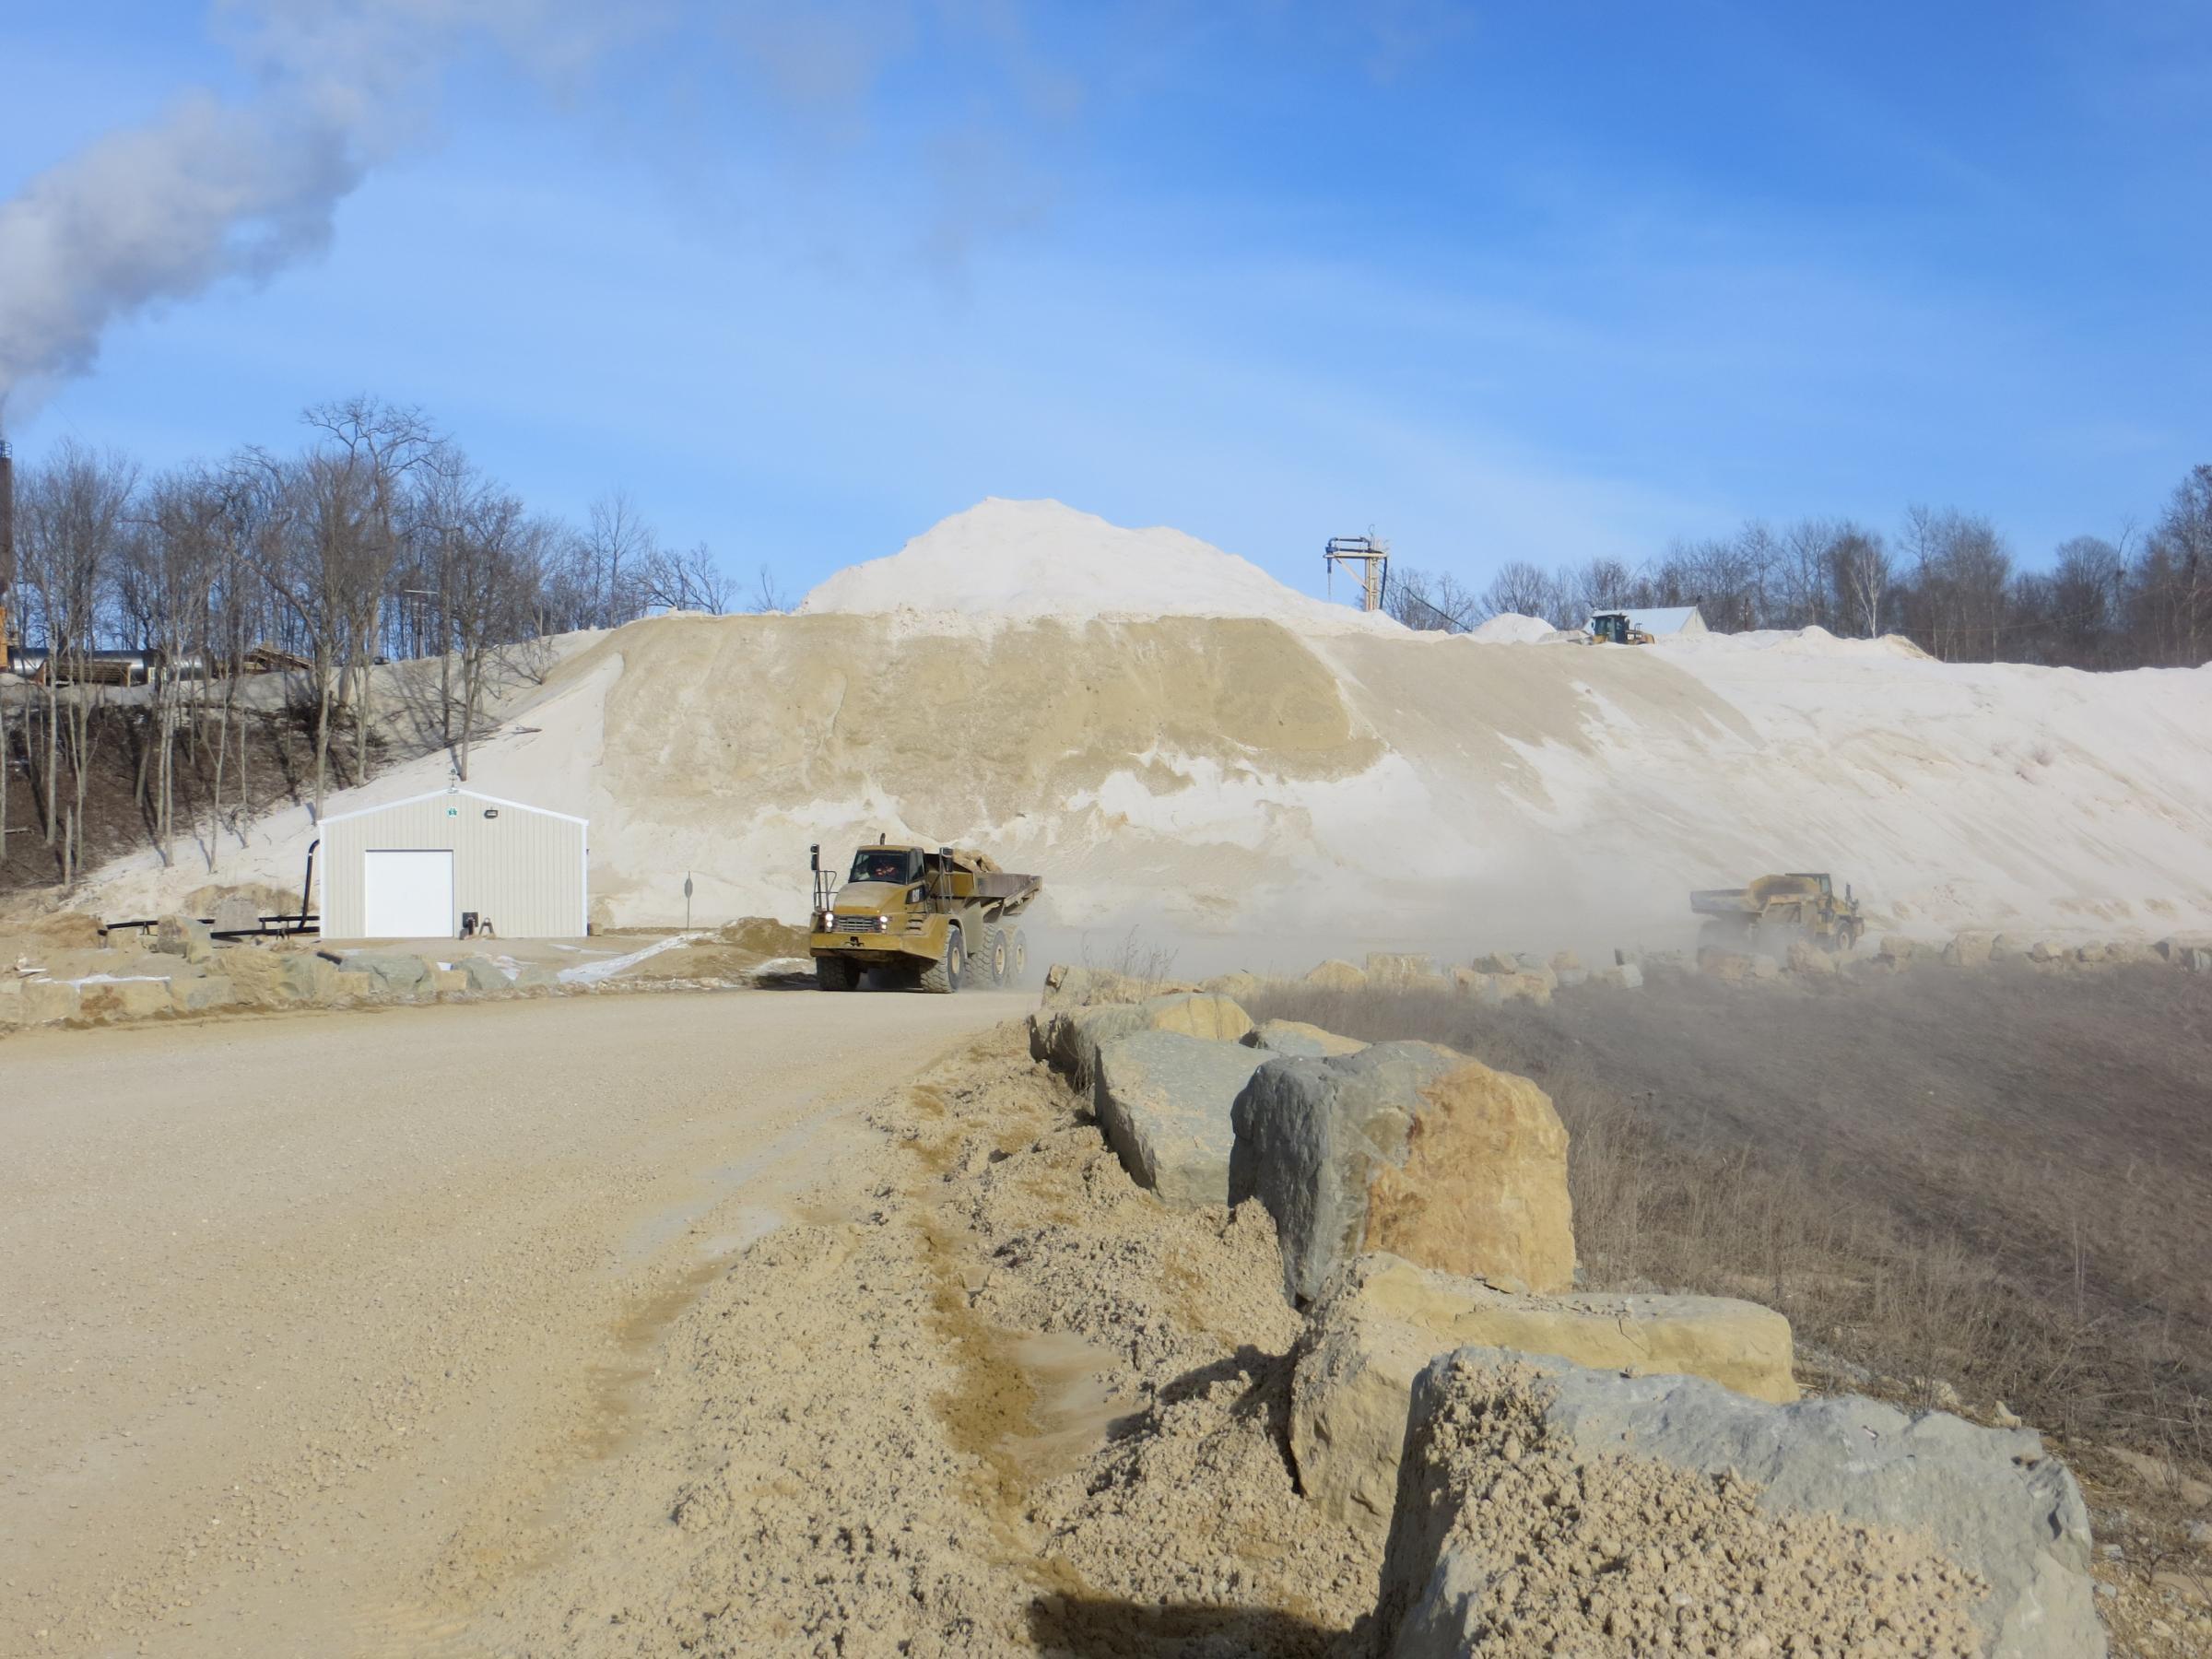 Mining: Frac sand